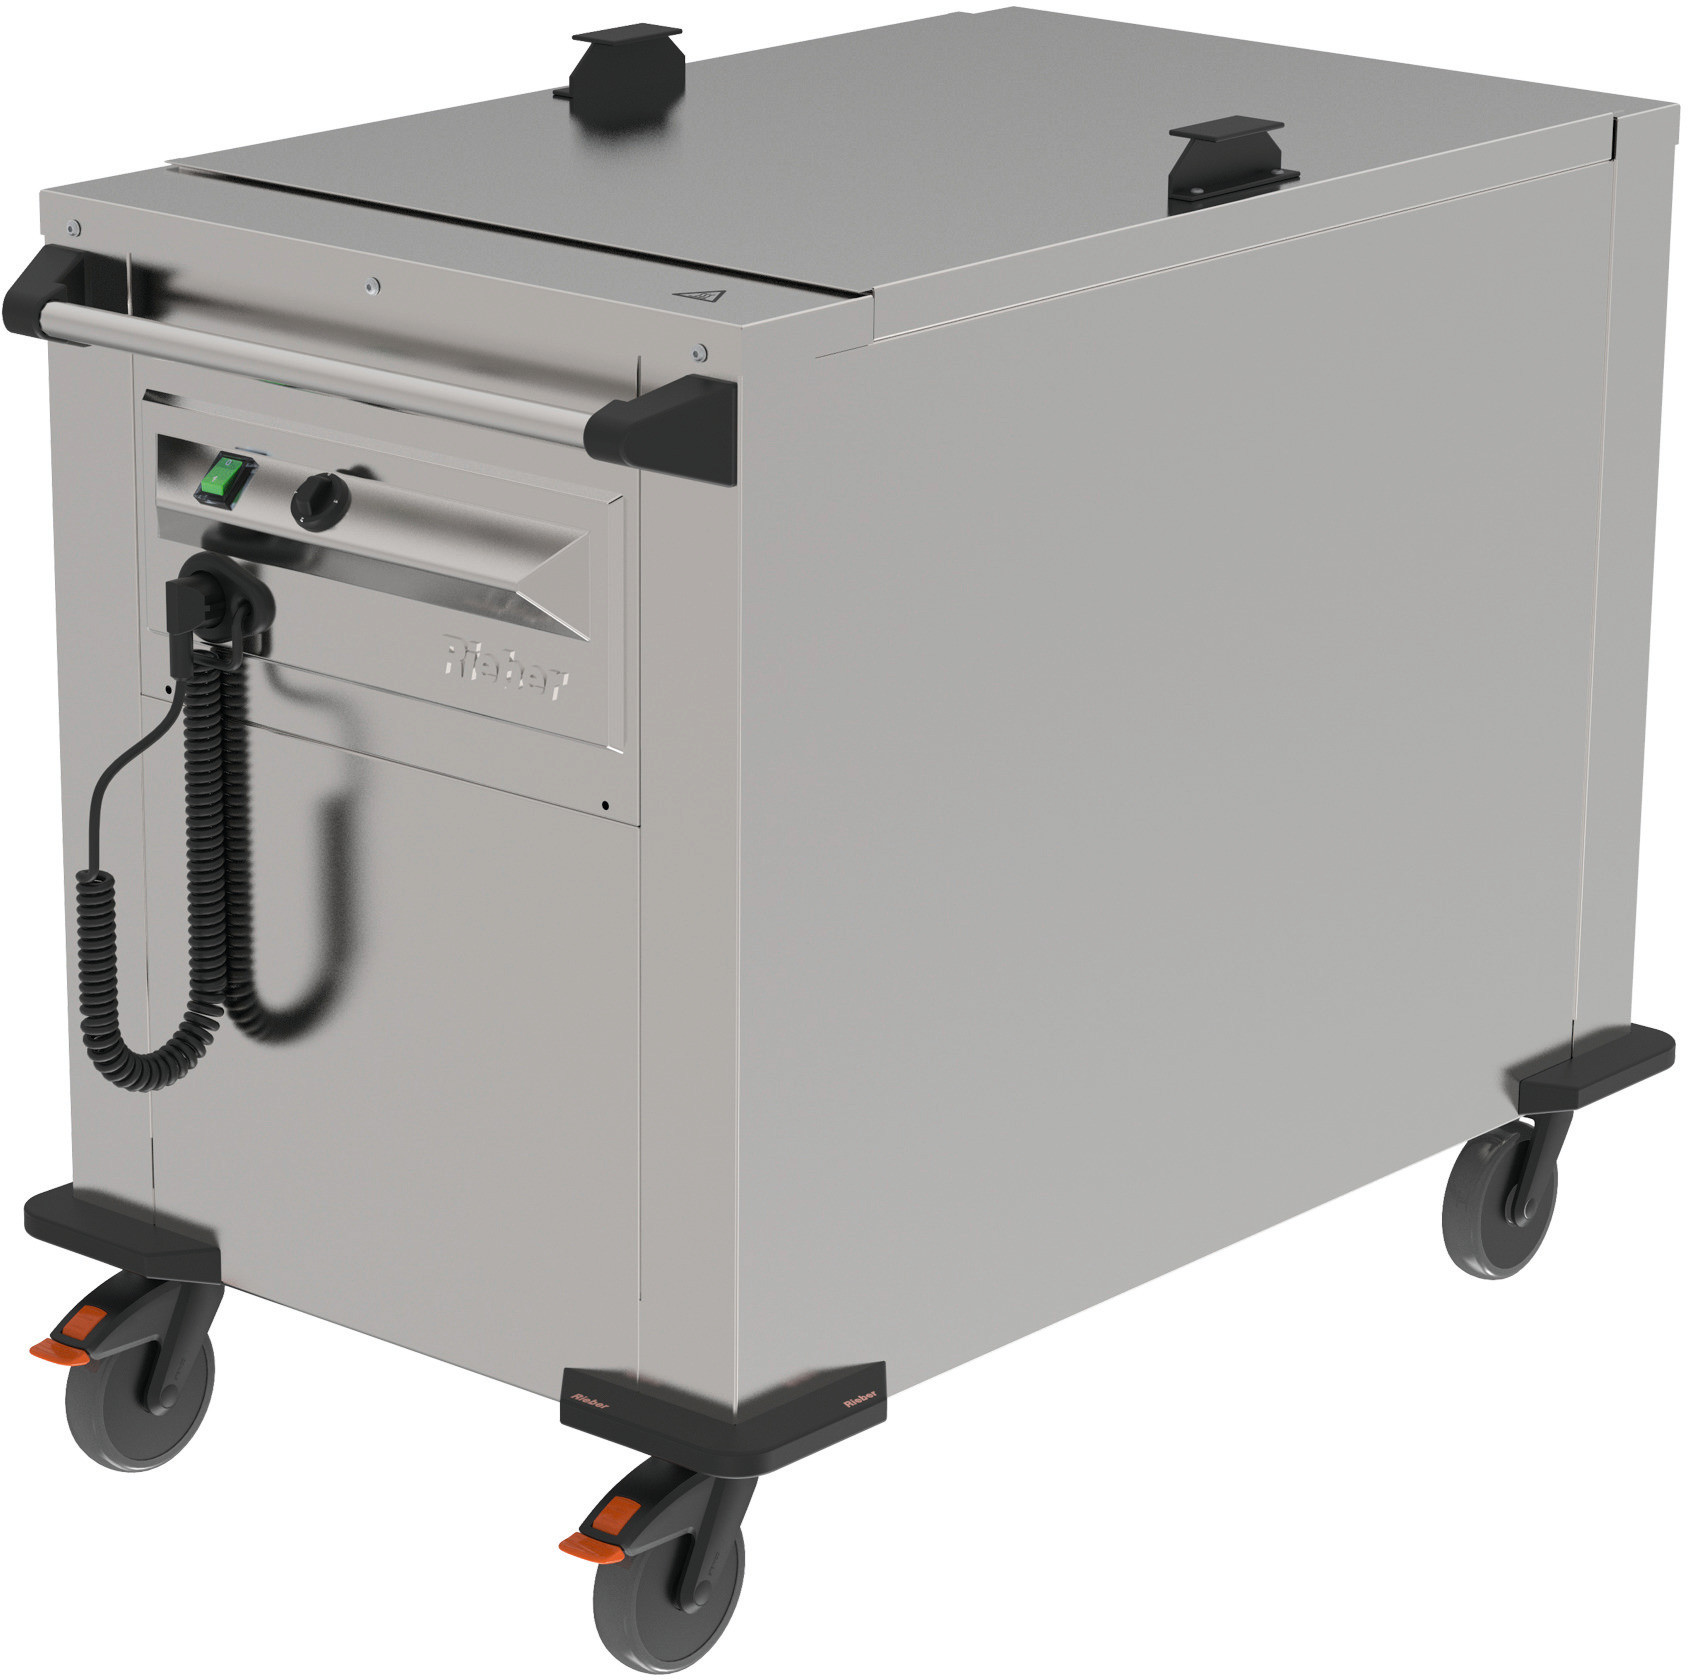 Plattformstapler fahrbar / Umluft beheizt / 535 x 810 mm / Stapelhöhe 600 mm